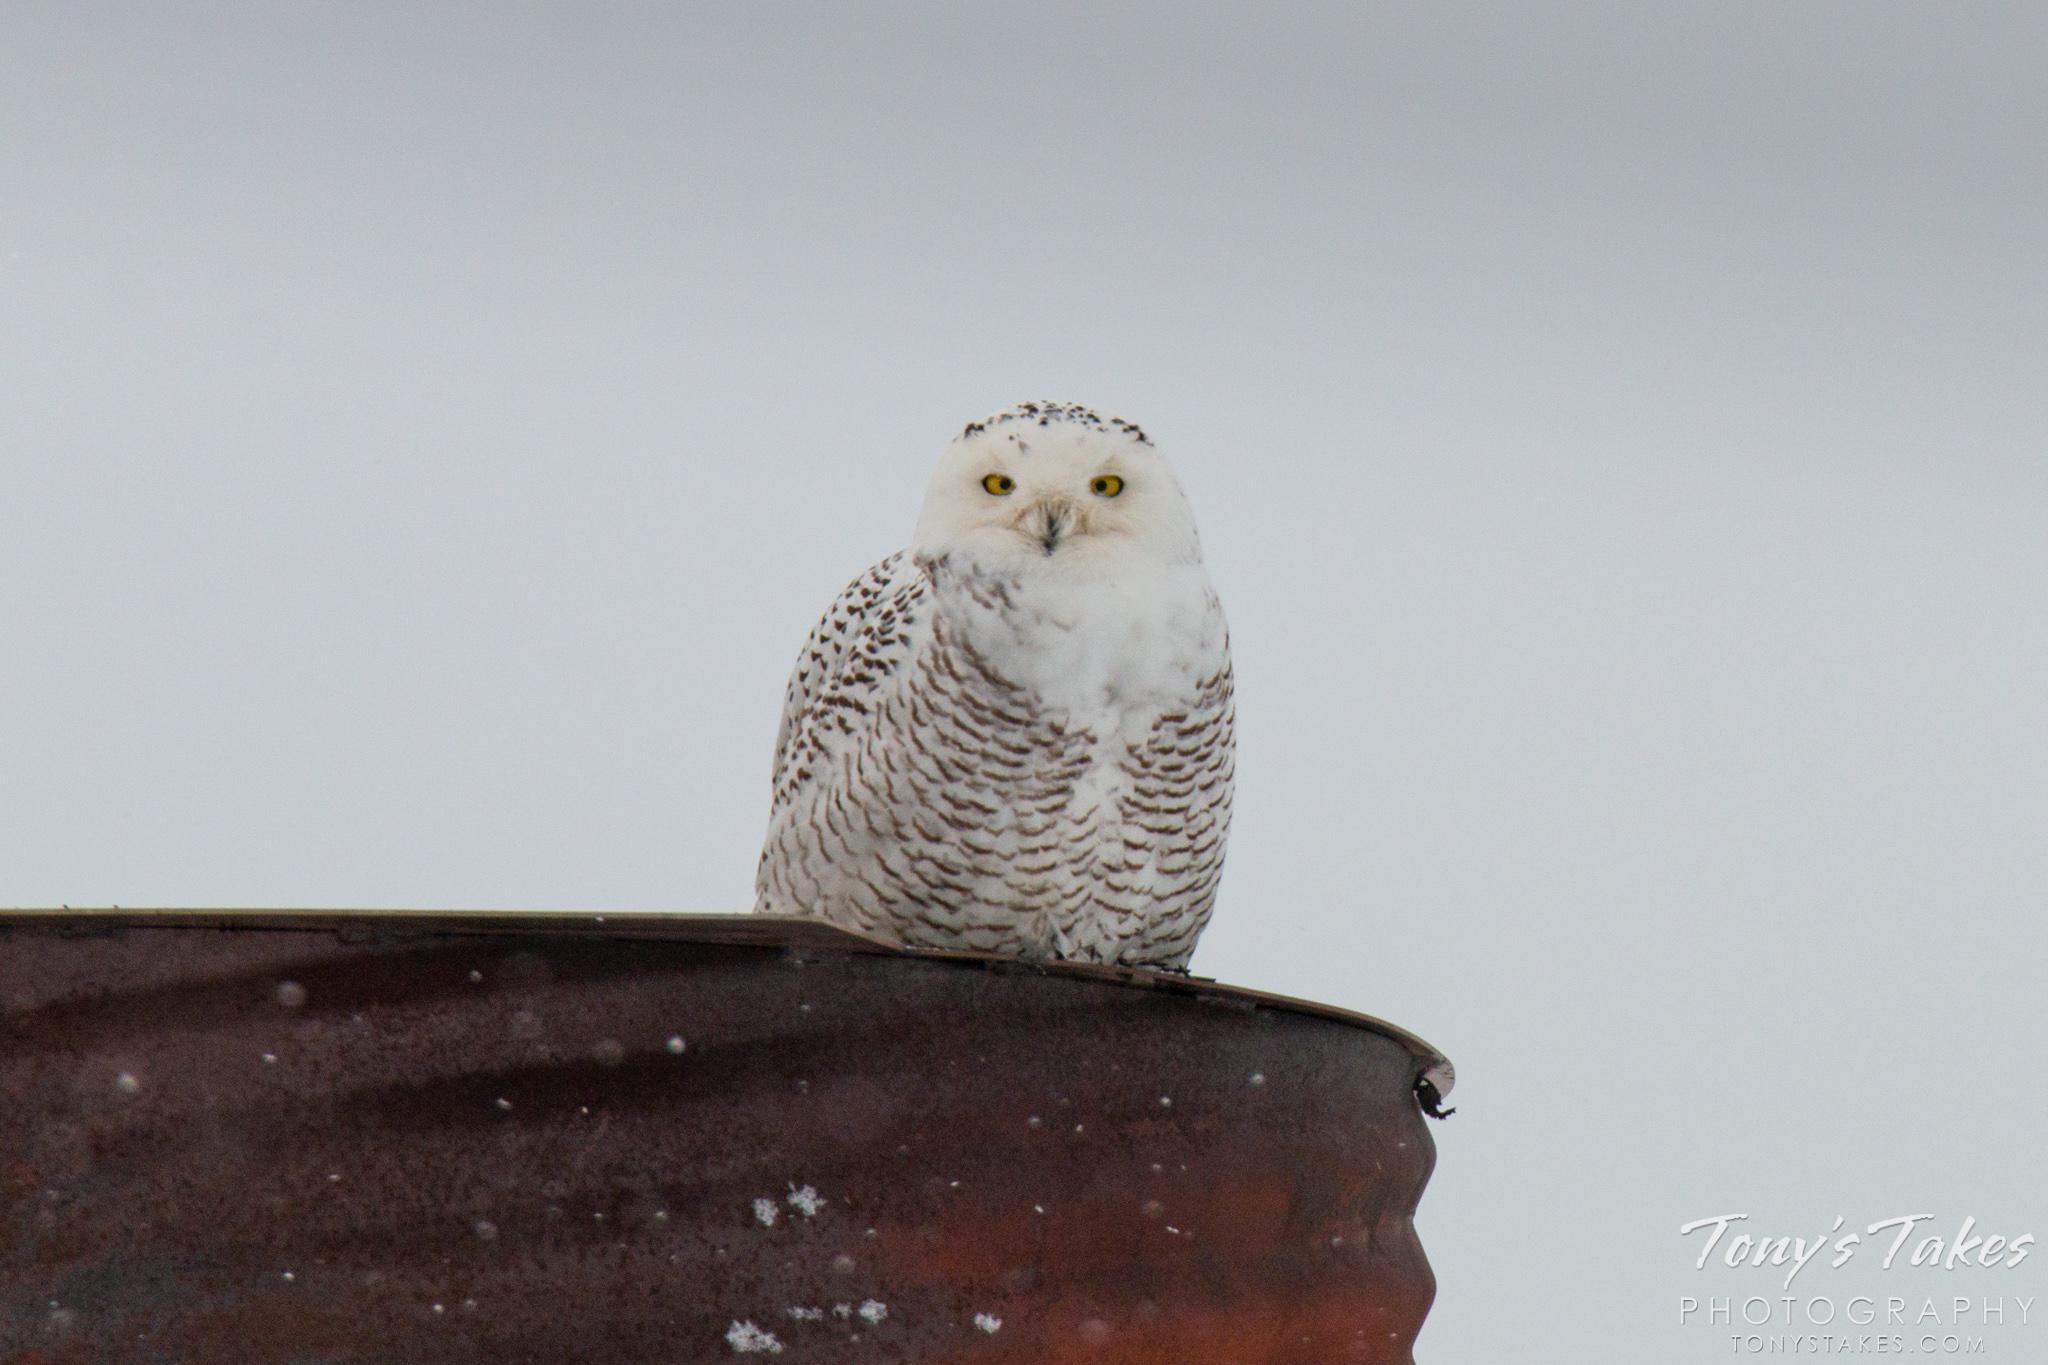 Return of the Snowy Owl?